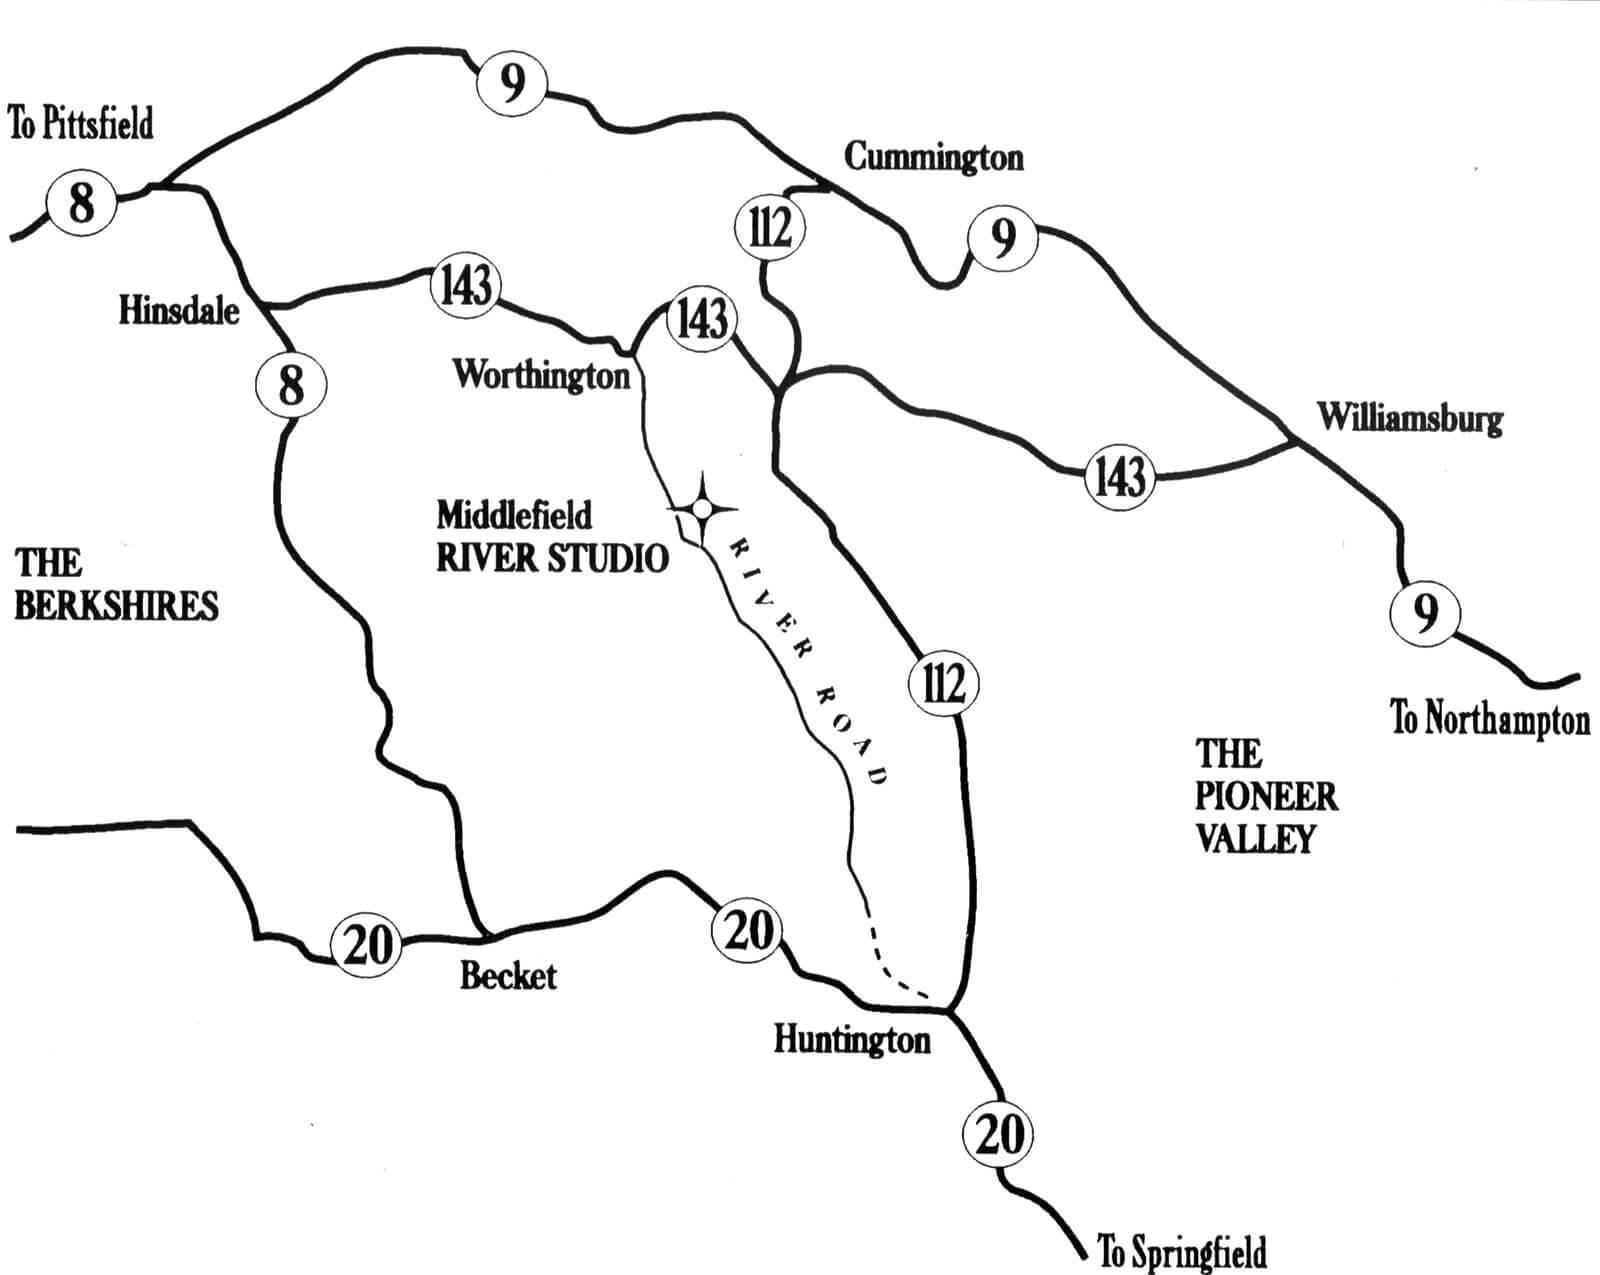 Map of River Studio location